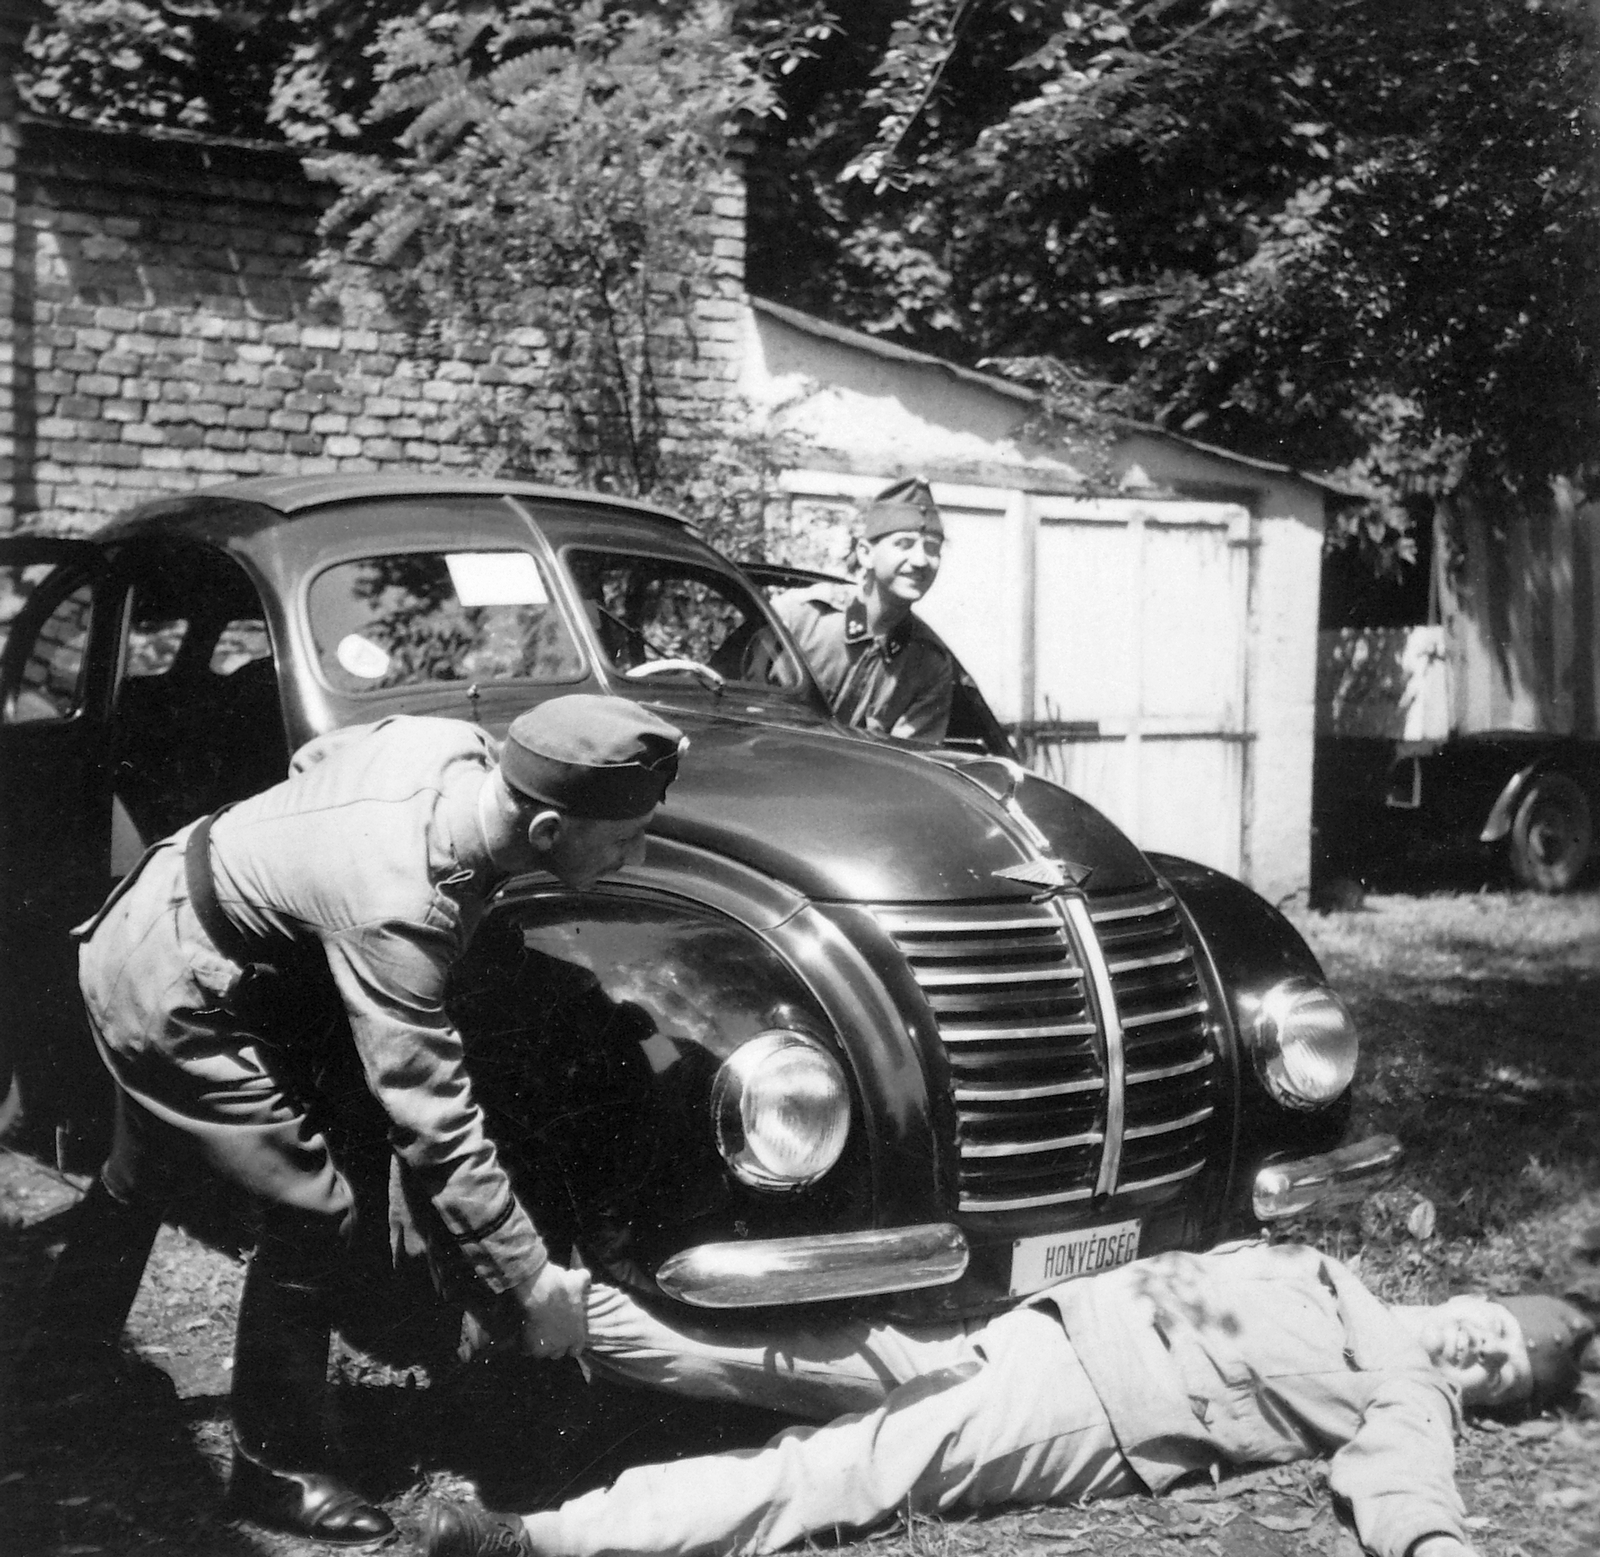 1940_hanomag.jpg